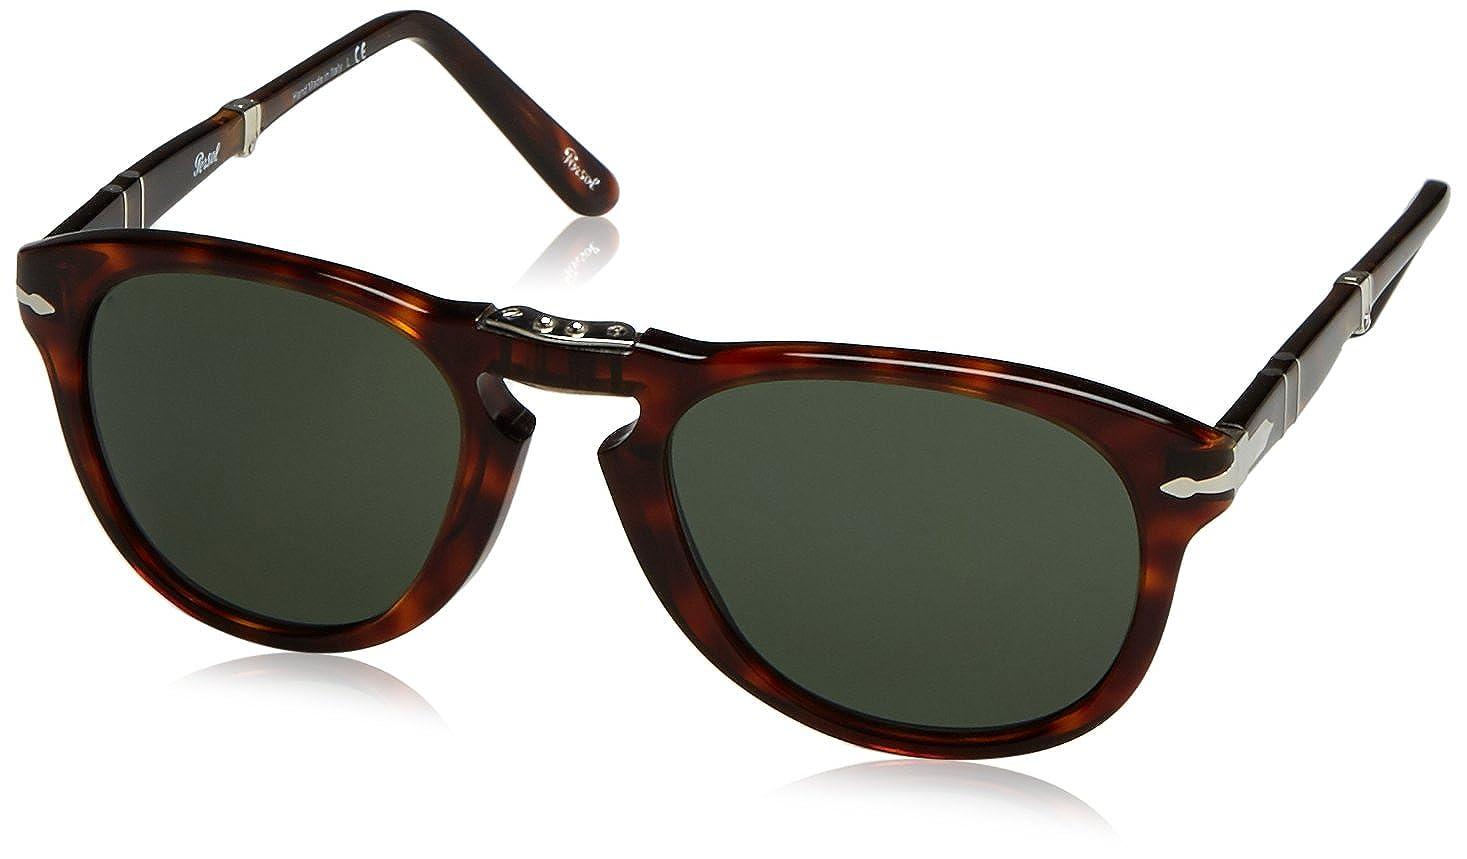 9d8ab0d516 Amazon.com  Persol Folding PO0714 Sunglasses-(24 31) Havana Crystal  Green-52mm  Persol  Shoes